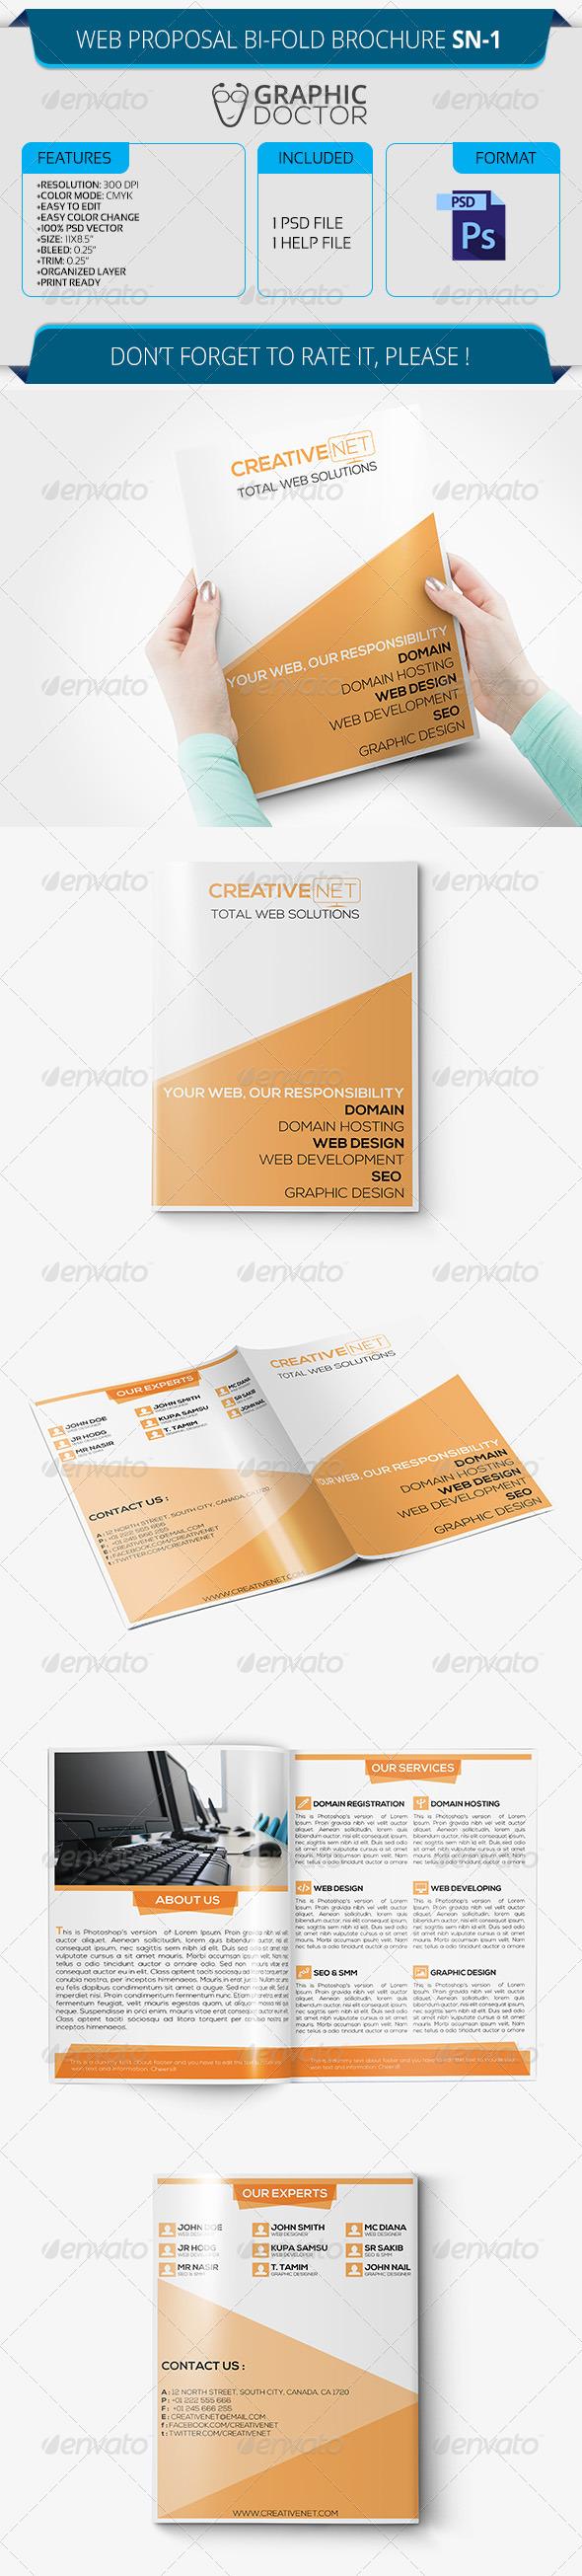 Web Proposal Bi-Fold Brochure SN-1 - Corporate Brochures